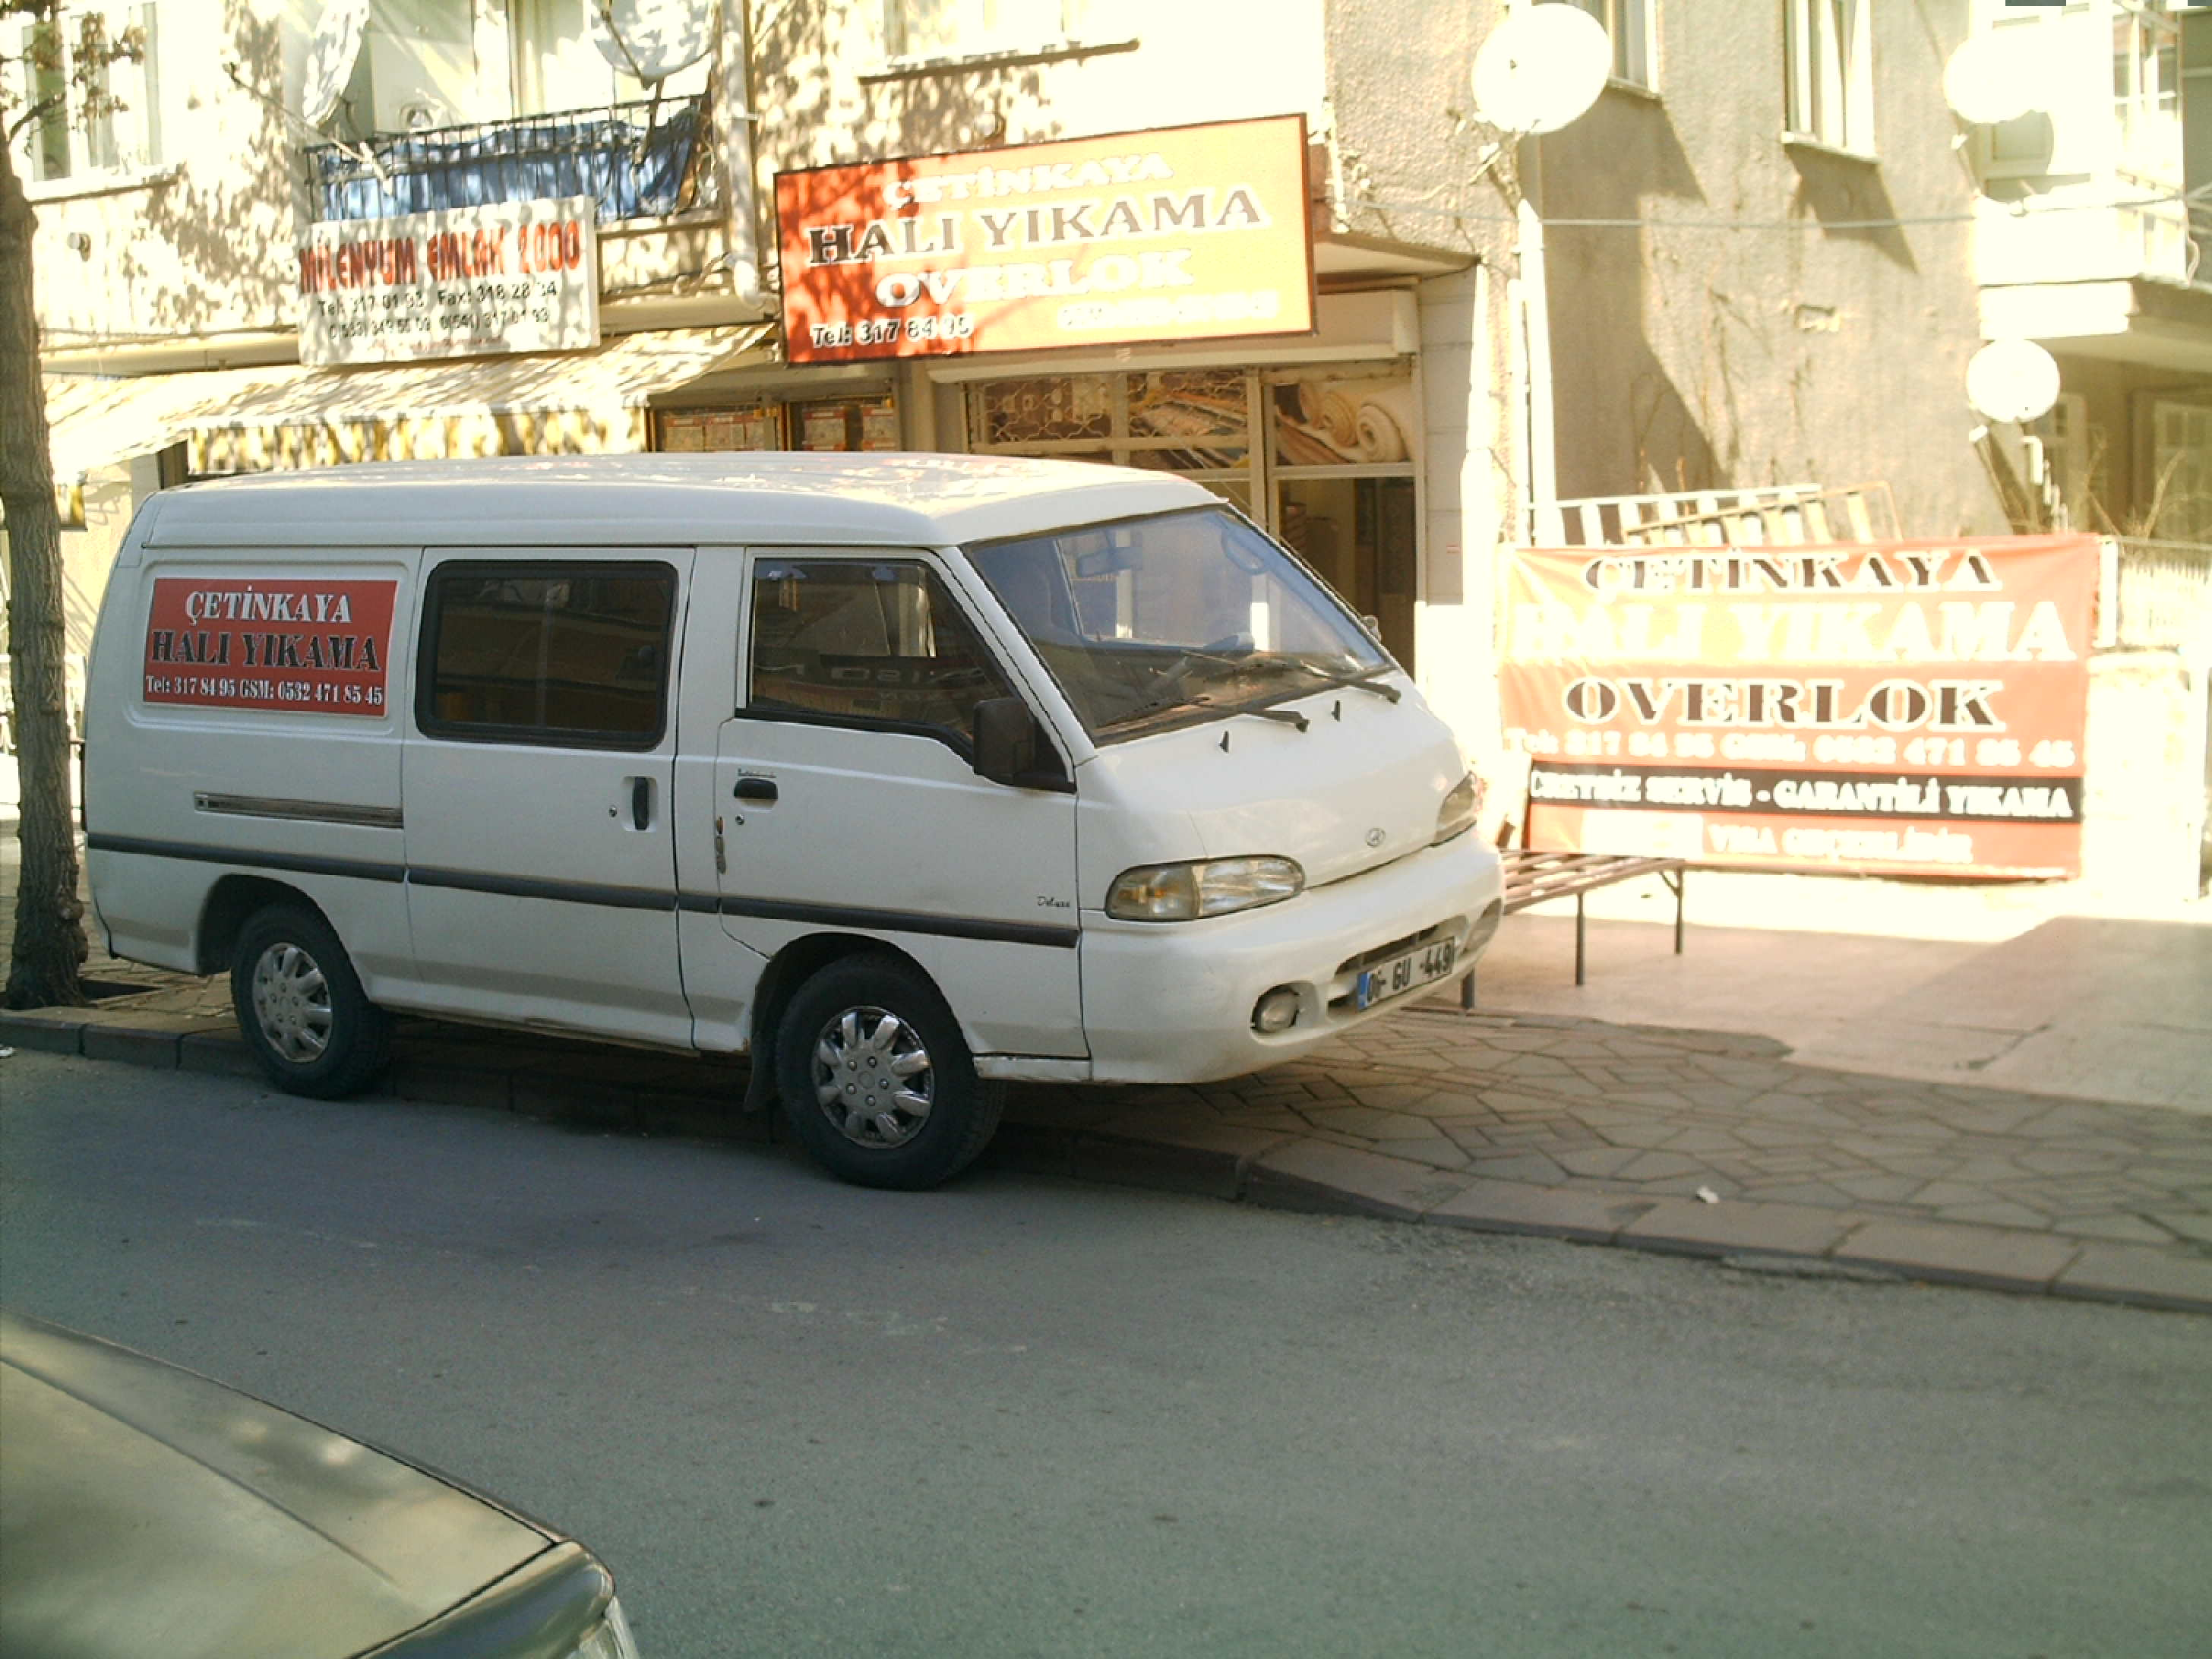 cebeci_hali_yikama_servis-1